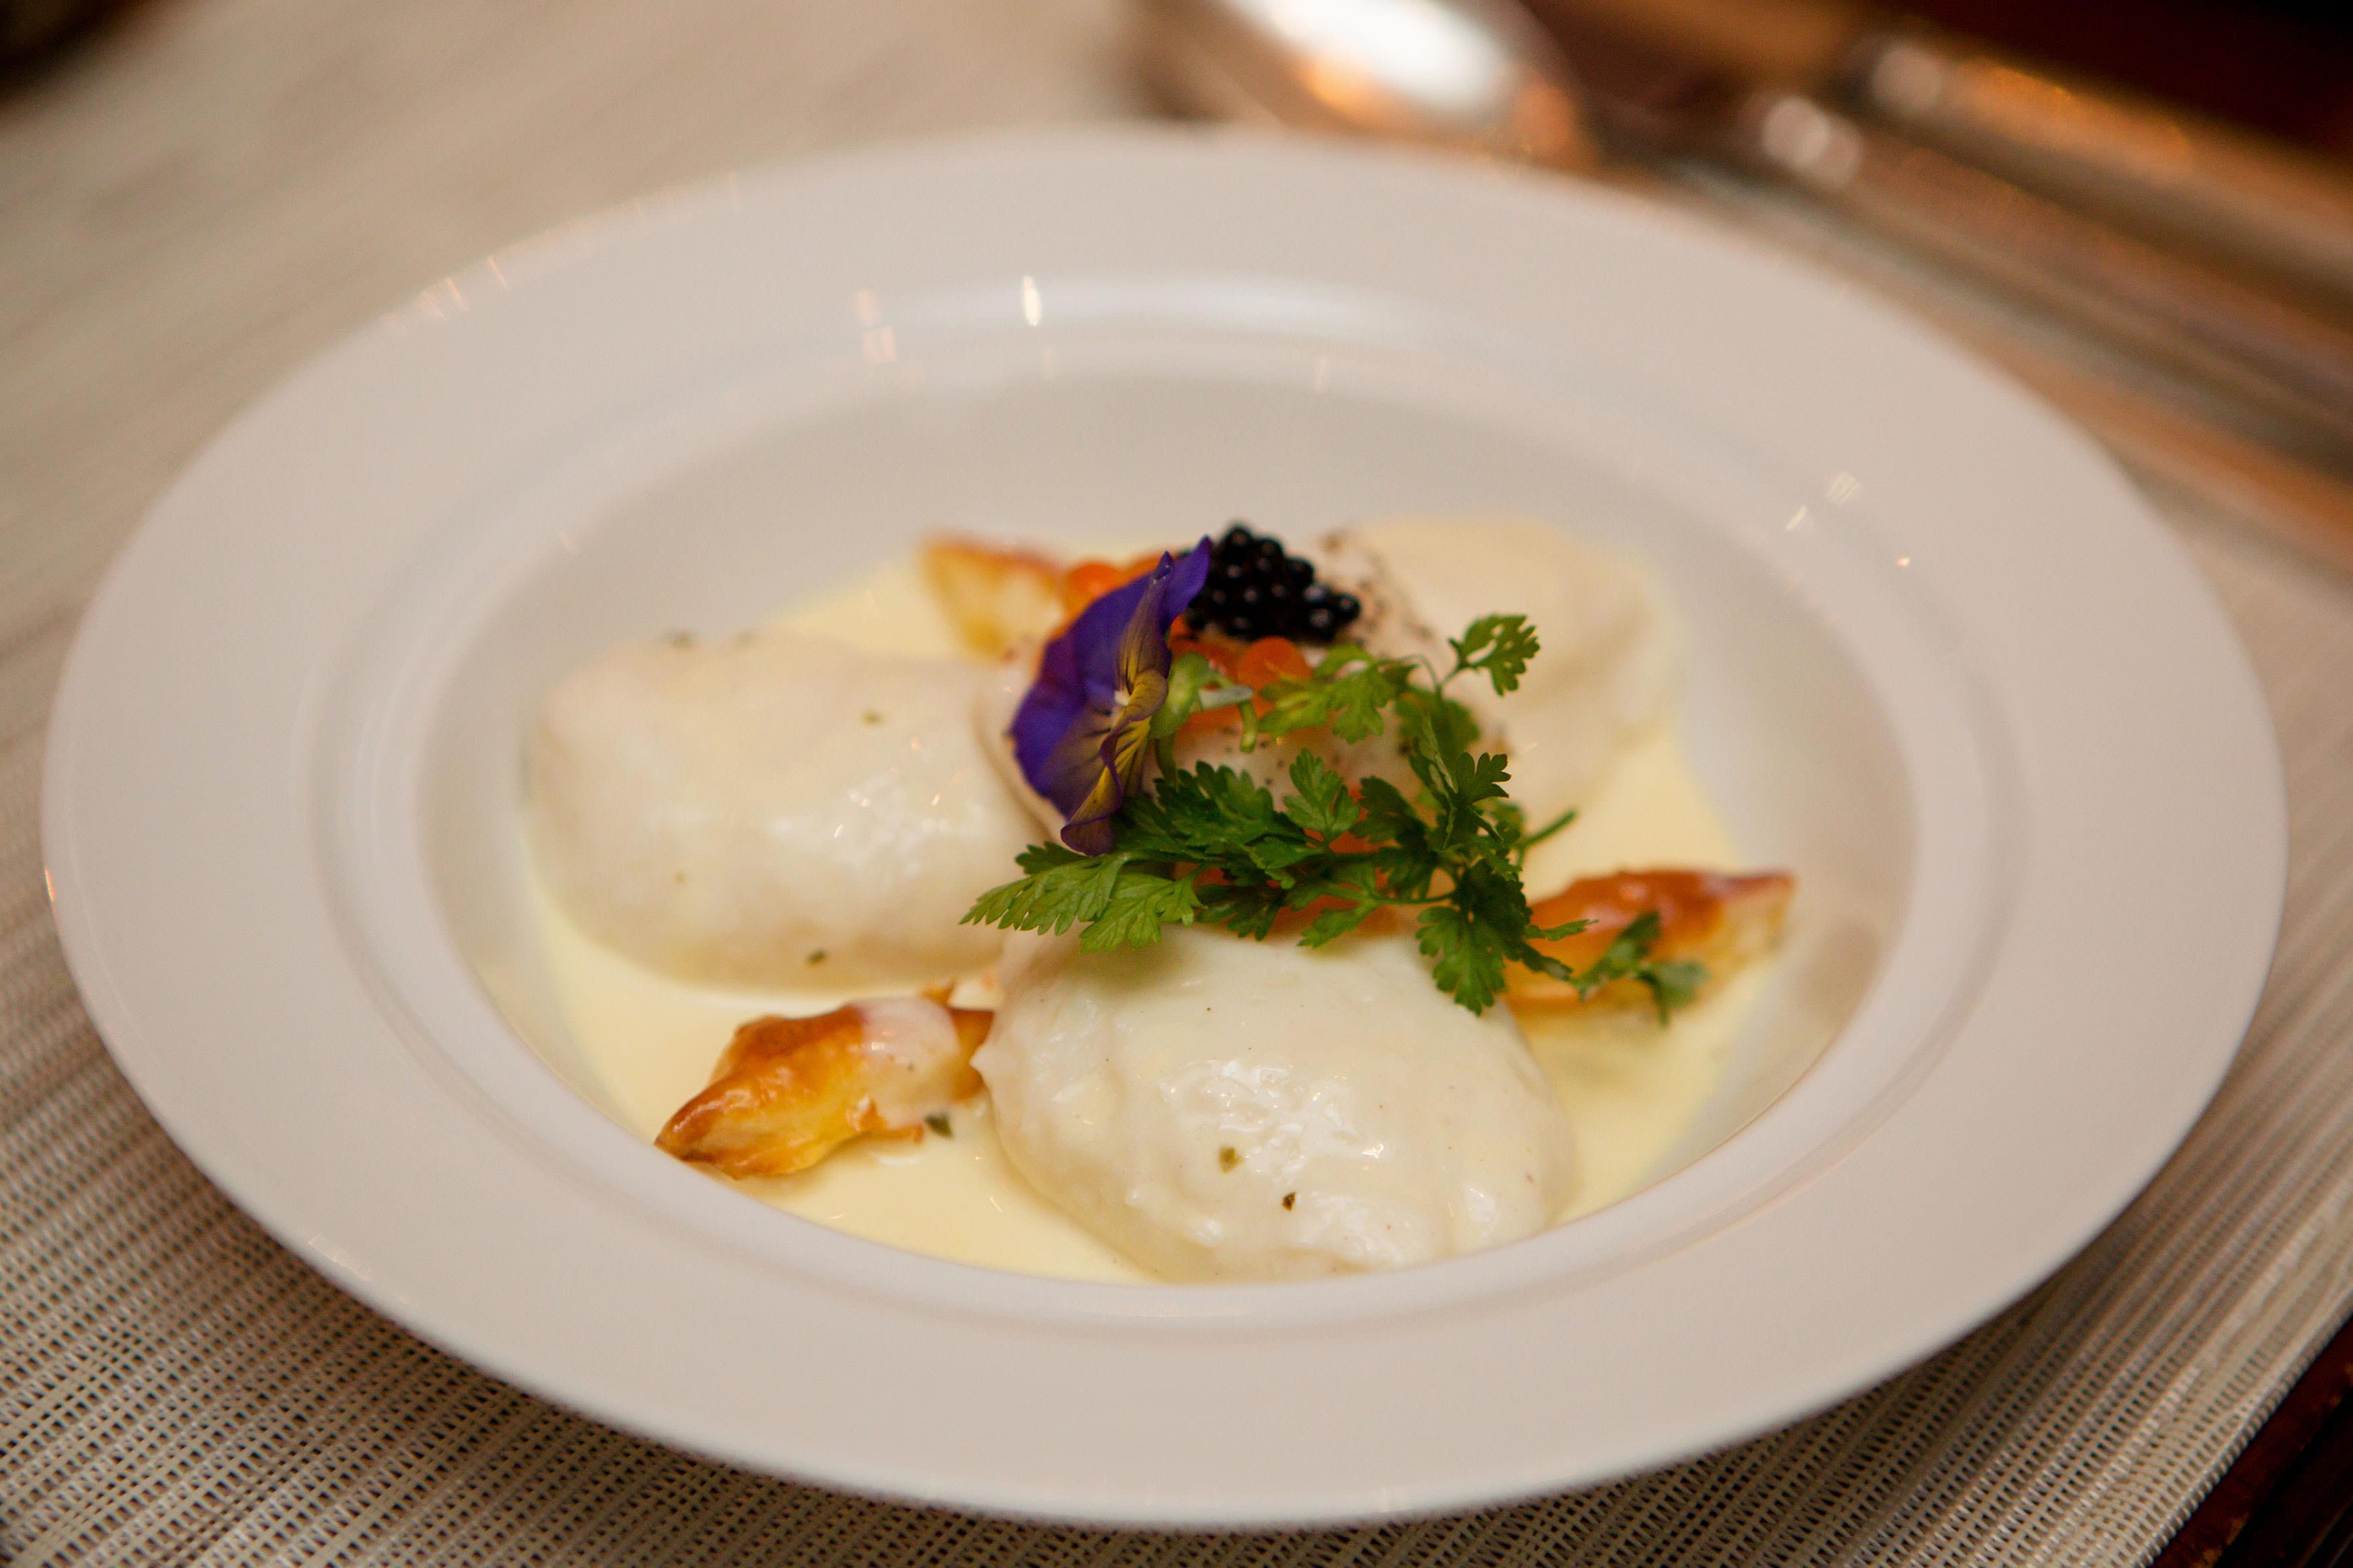 Ambassadors' Dinner - Regency Christmas Feast- Quenelles of Sole